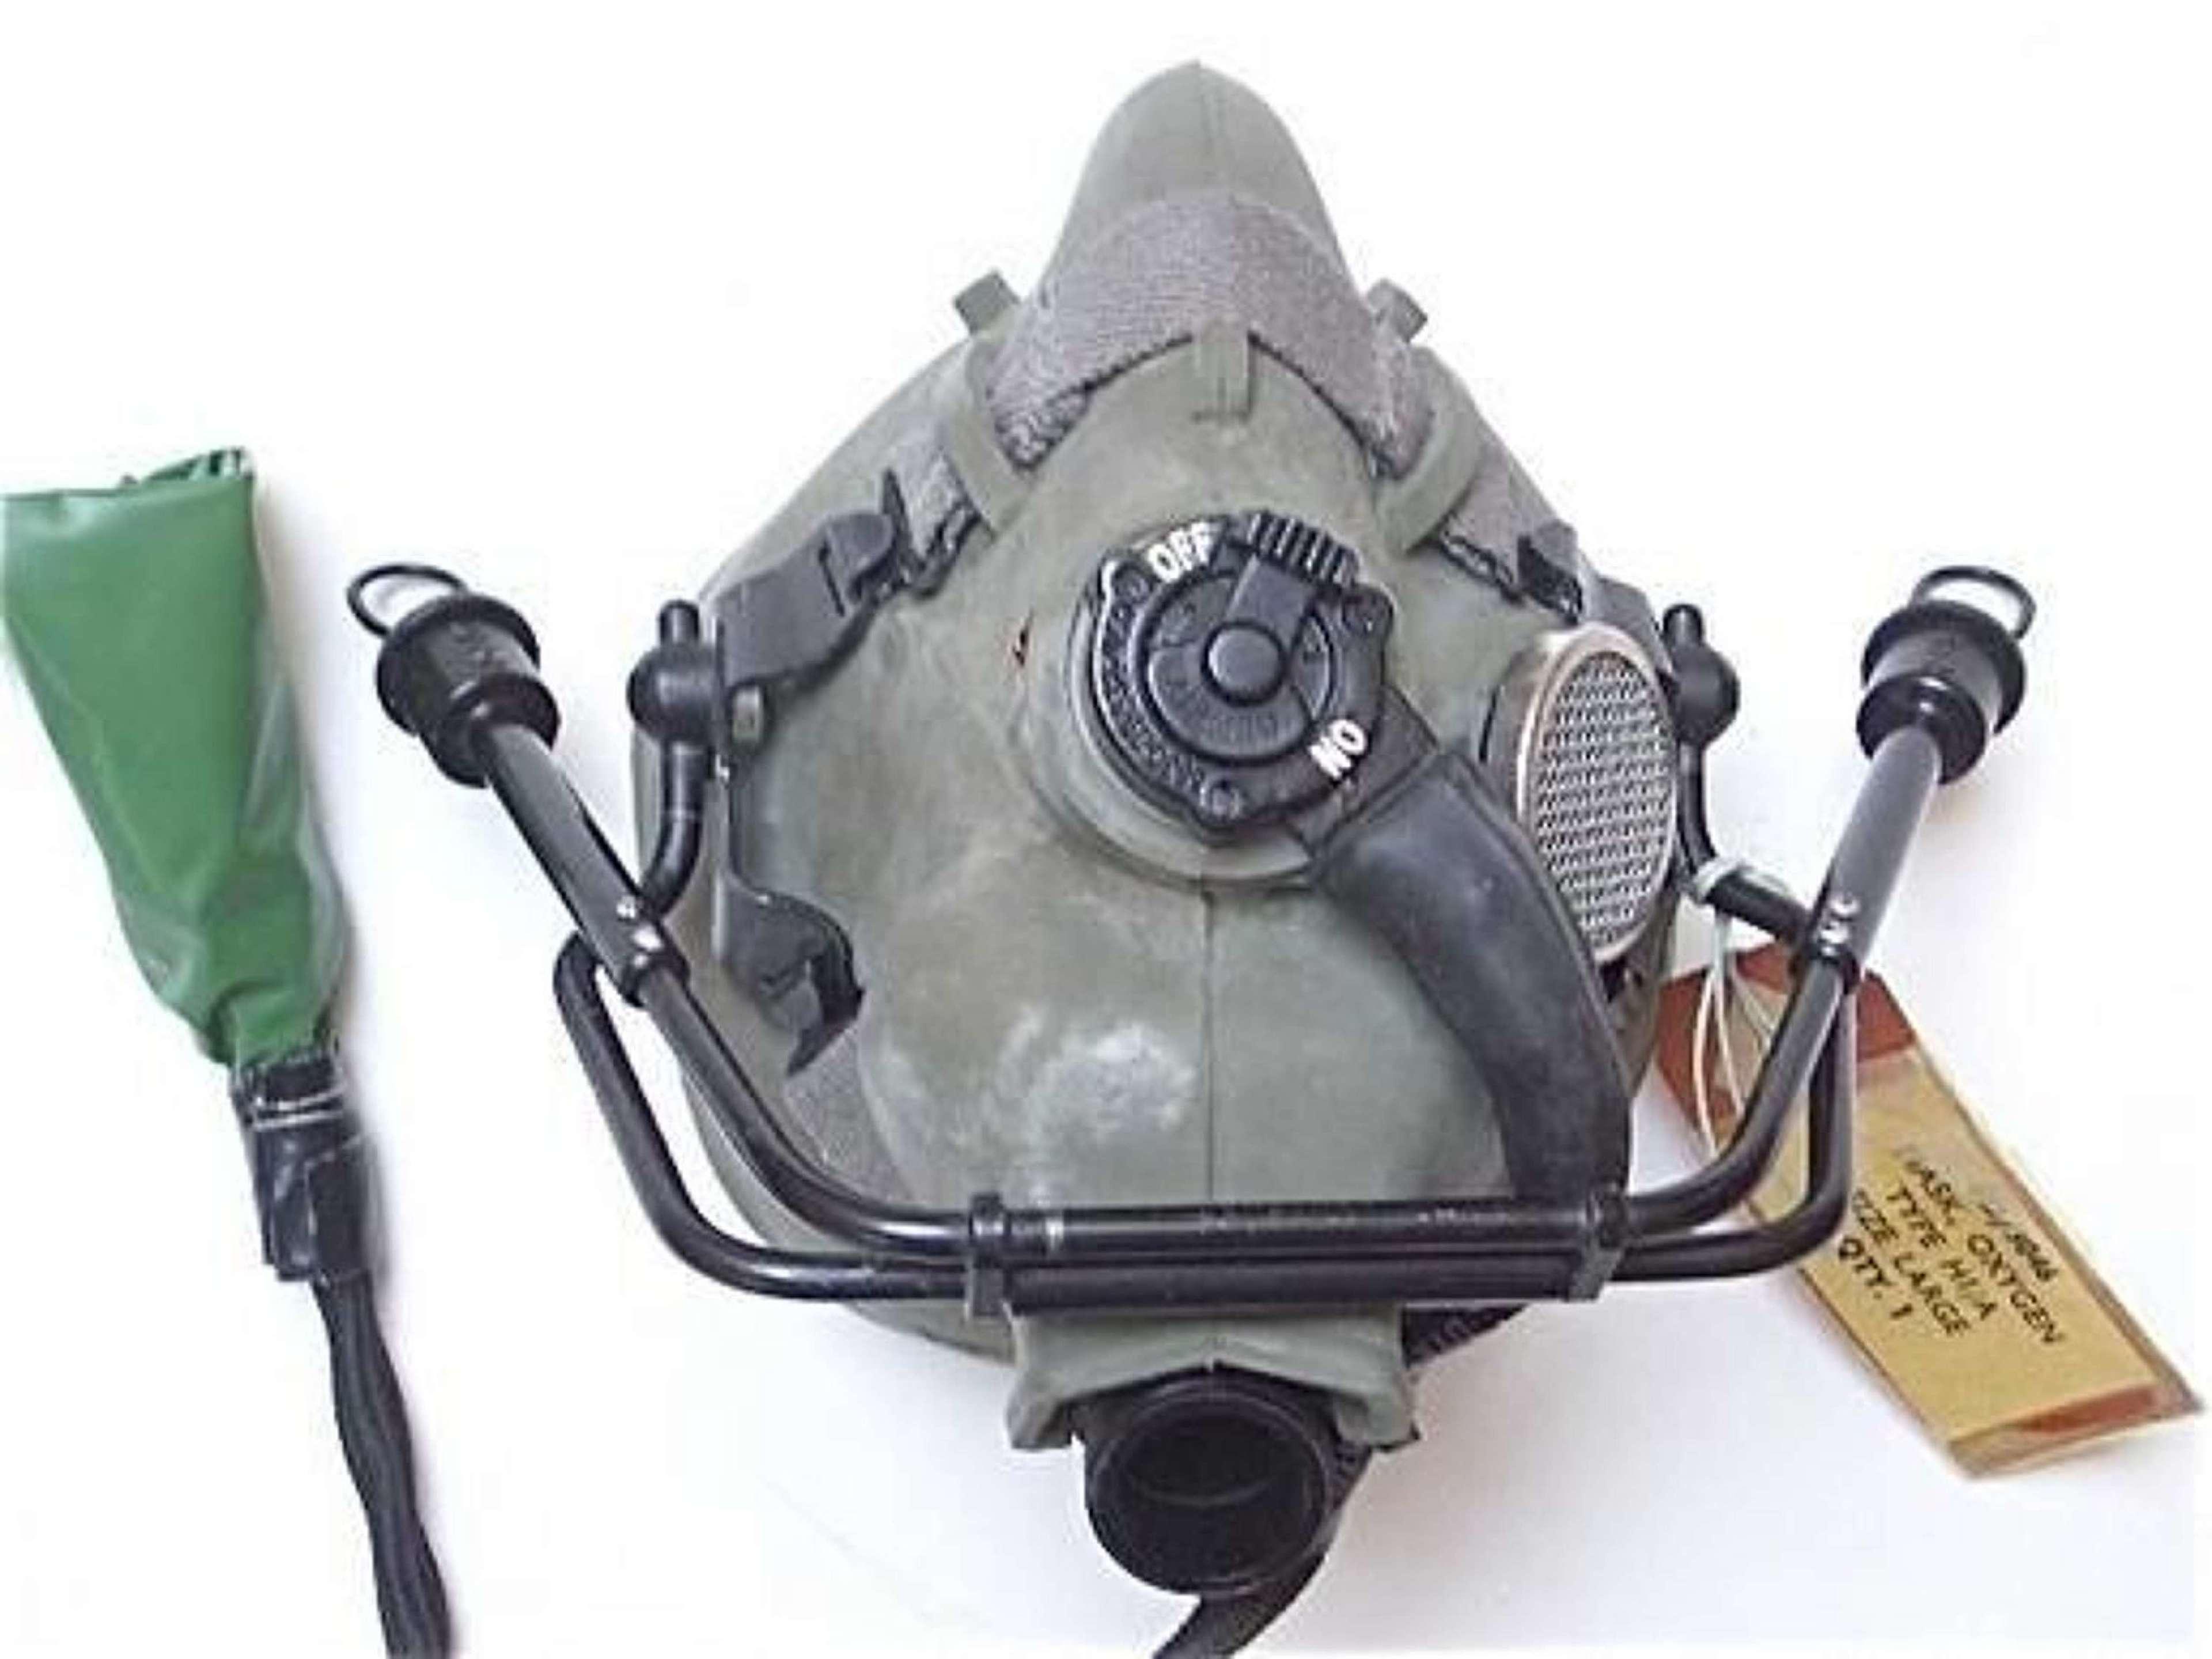 RAF Cold War Period Rare Type H1/A Oxygen Mask